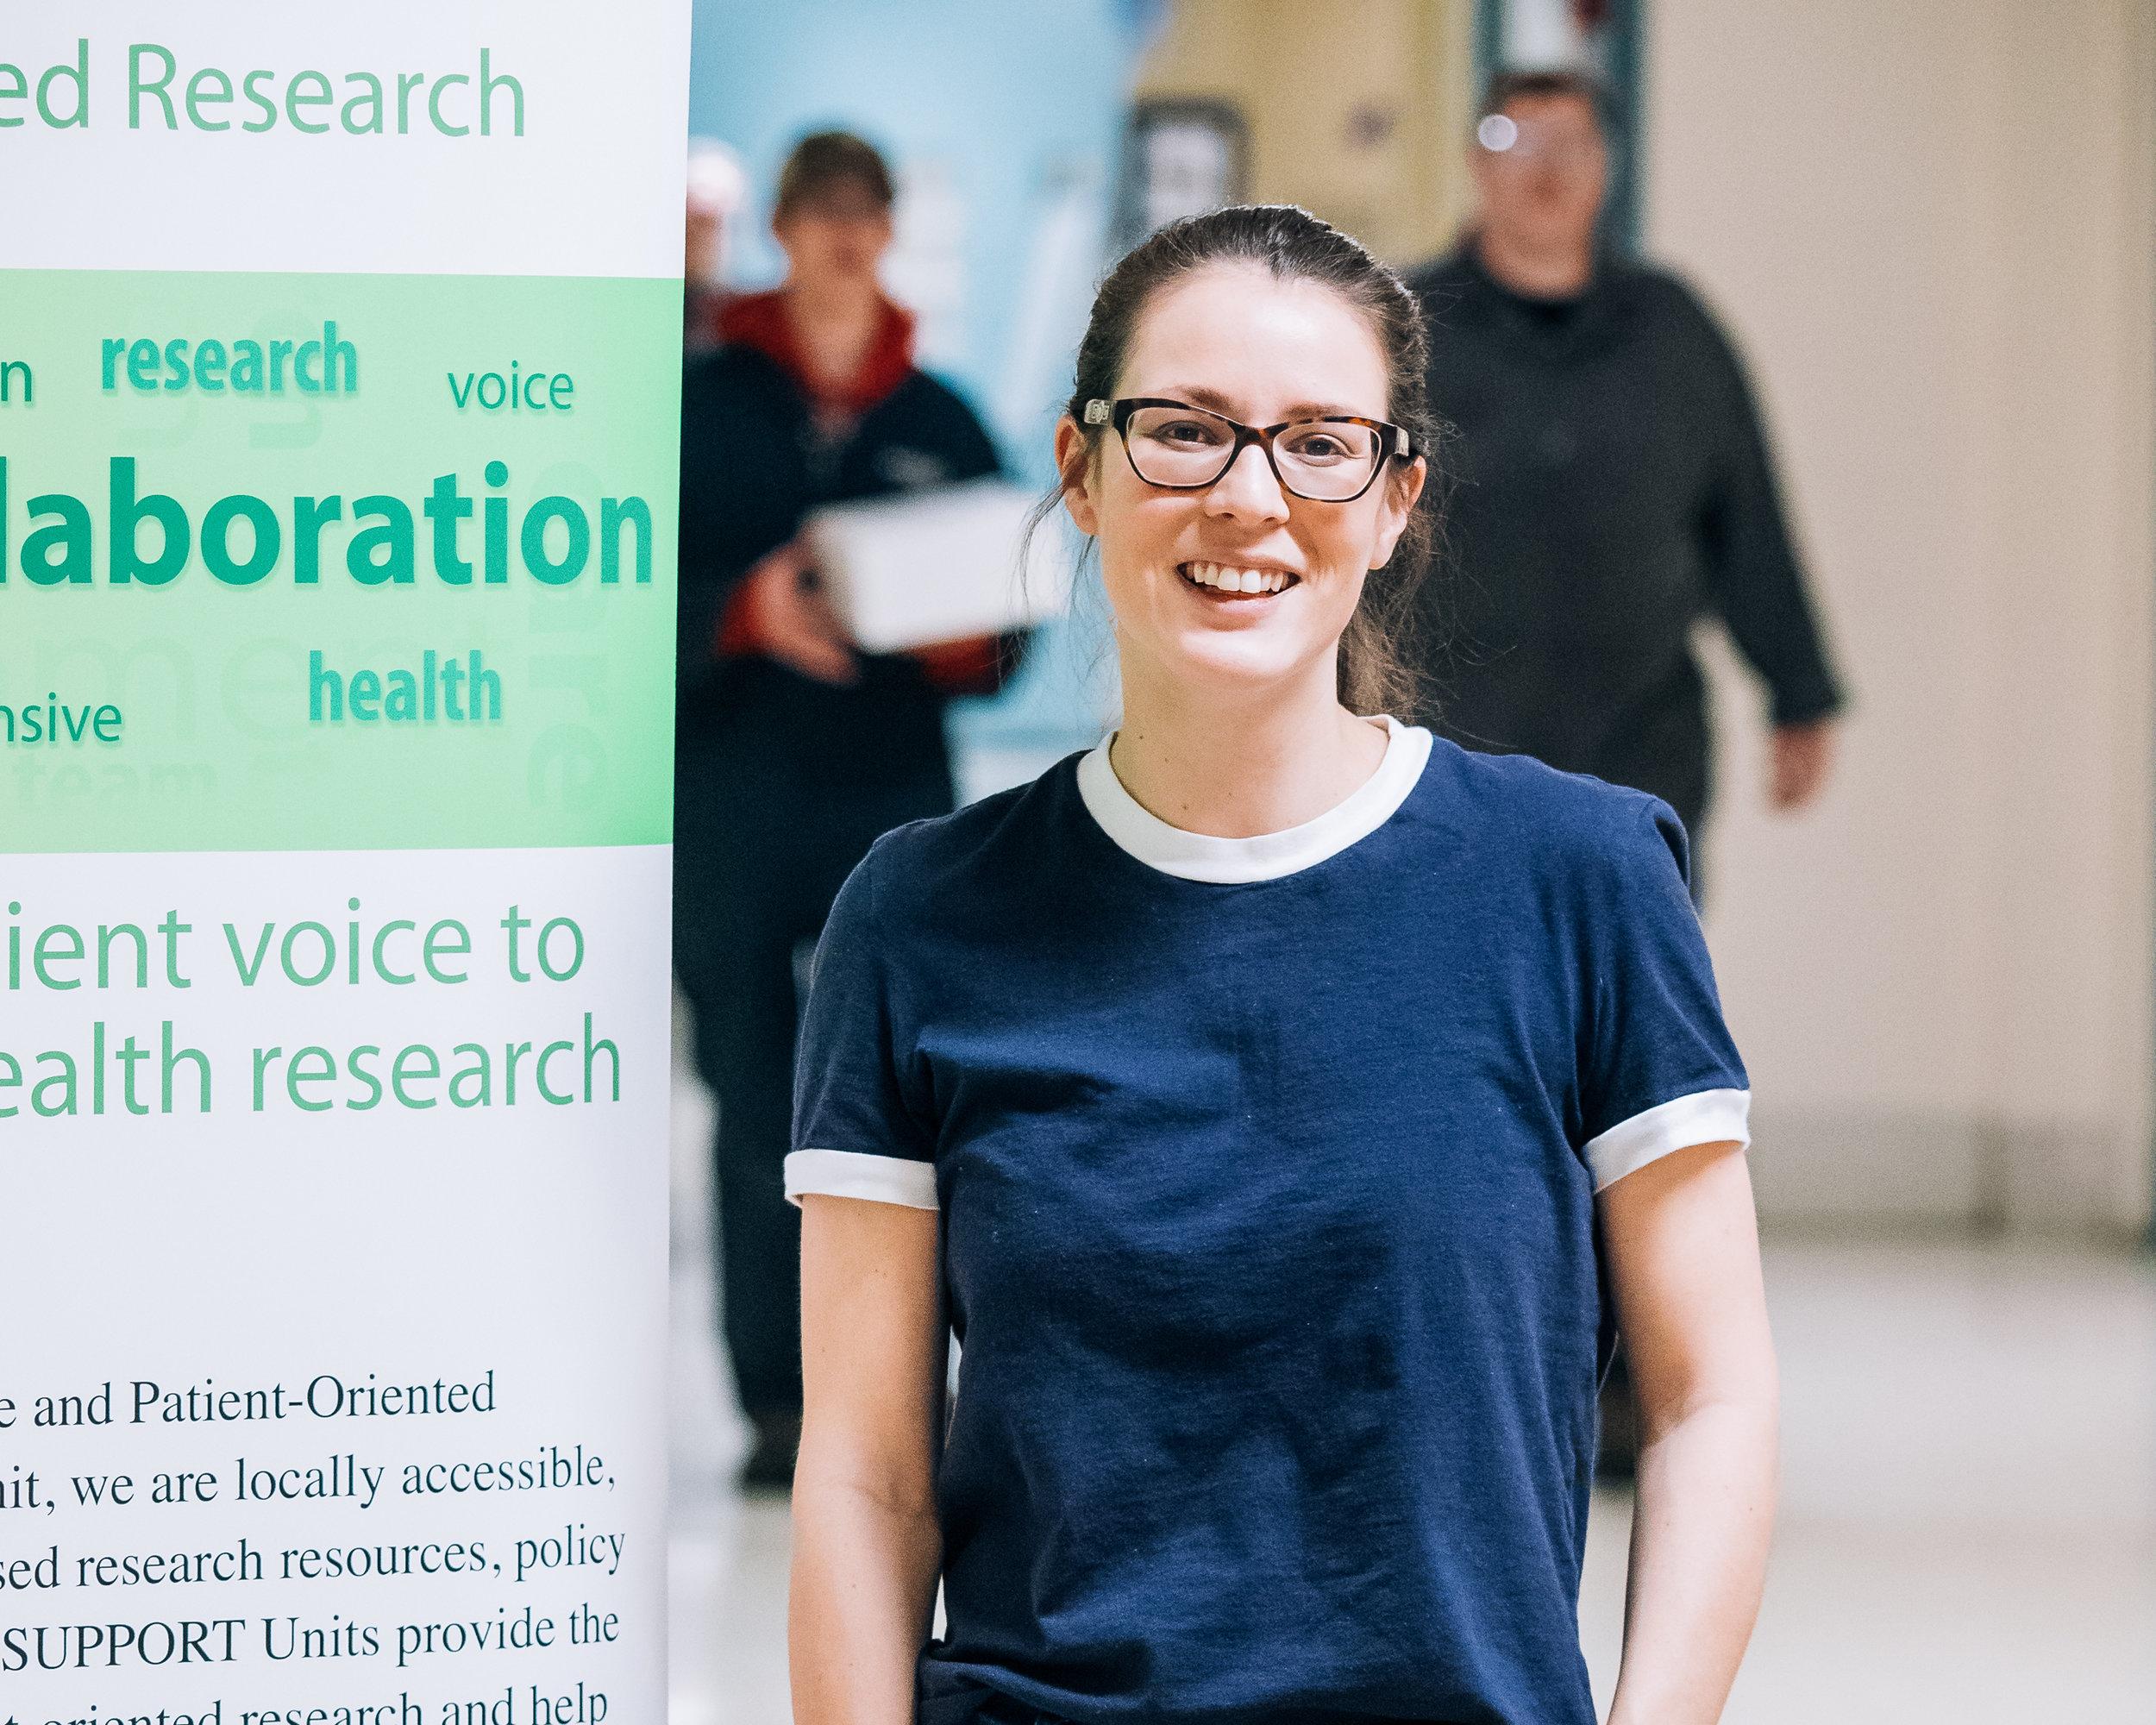 SCPOR trainee Carrie Pratt, MSc student in the College of Nursing at the University of Saskatchewan (Photo by: Chris Plishka)